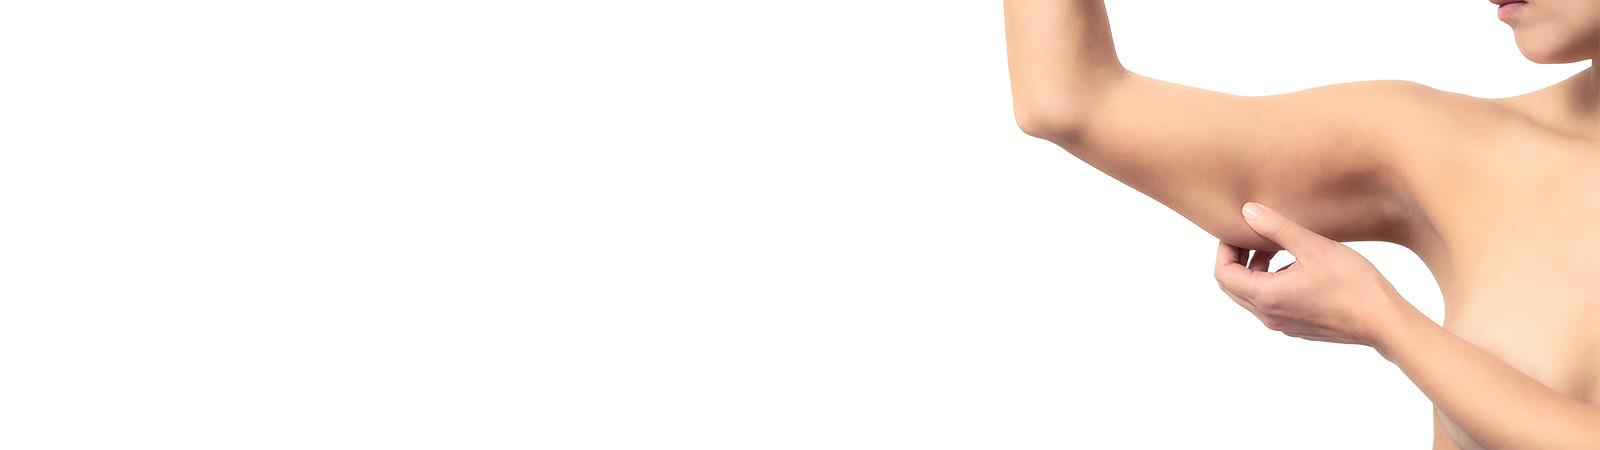 Oberarmstraffung bei Winkearmen - Dr. Armin Rau